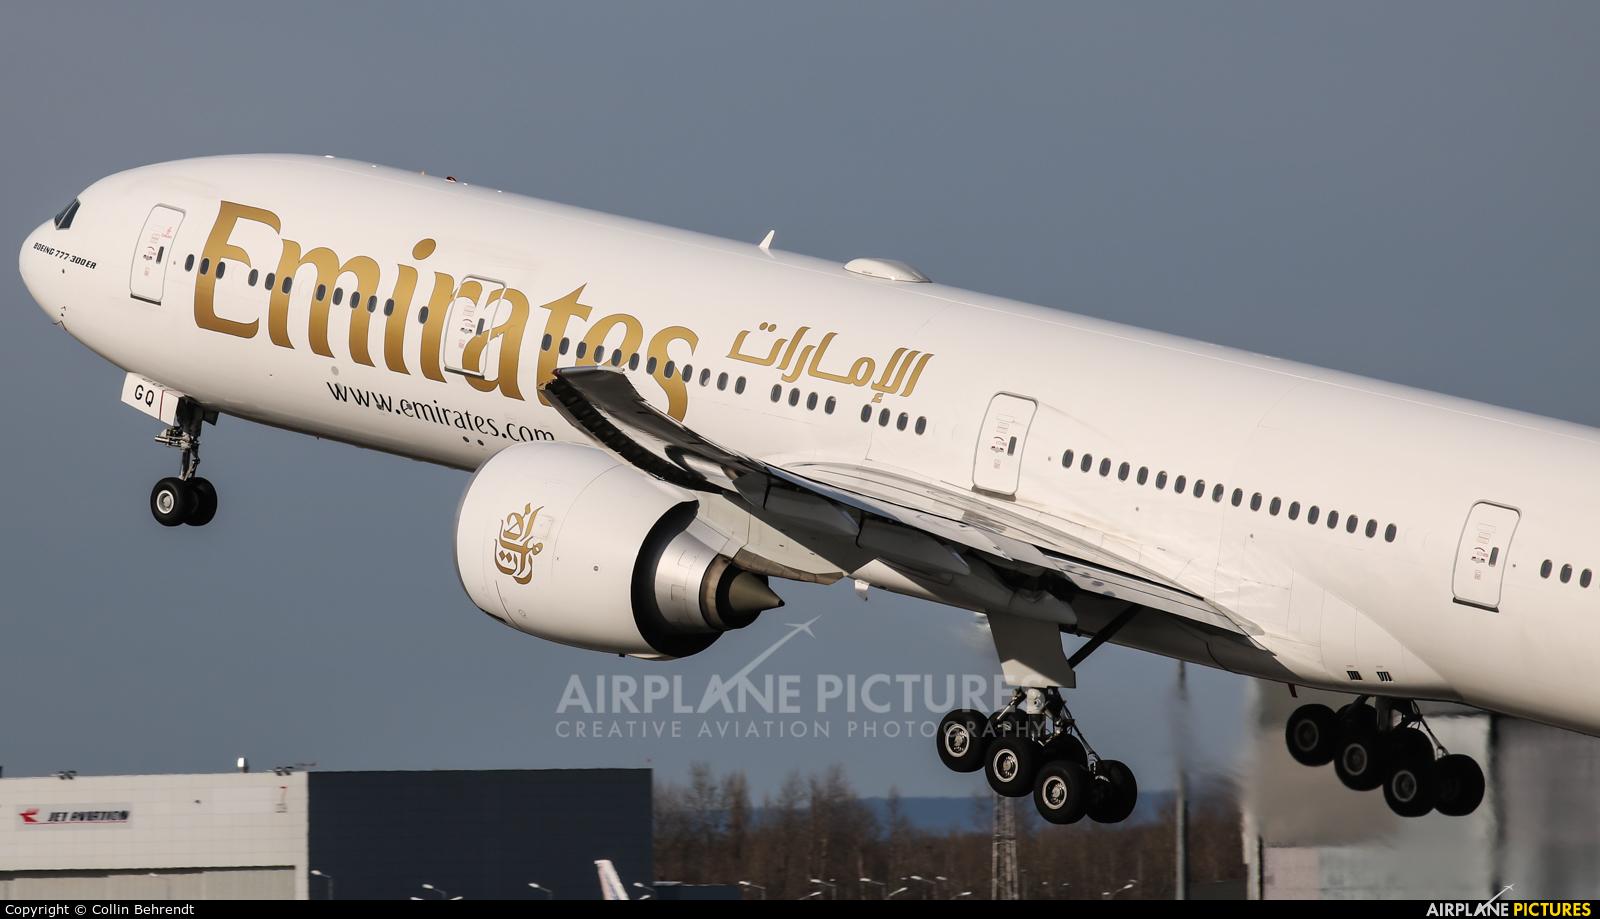 Emirates Airlines A6-EGQ aircraft at Vienna - Schwechat